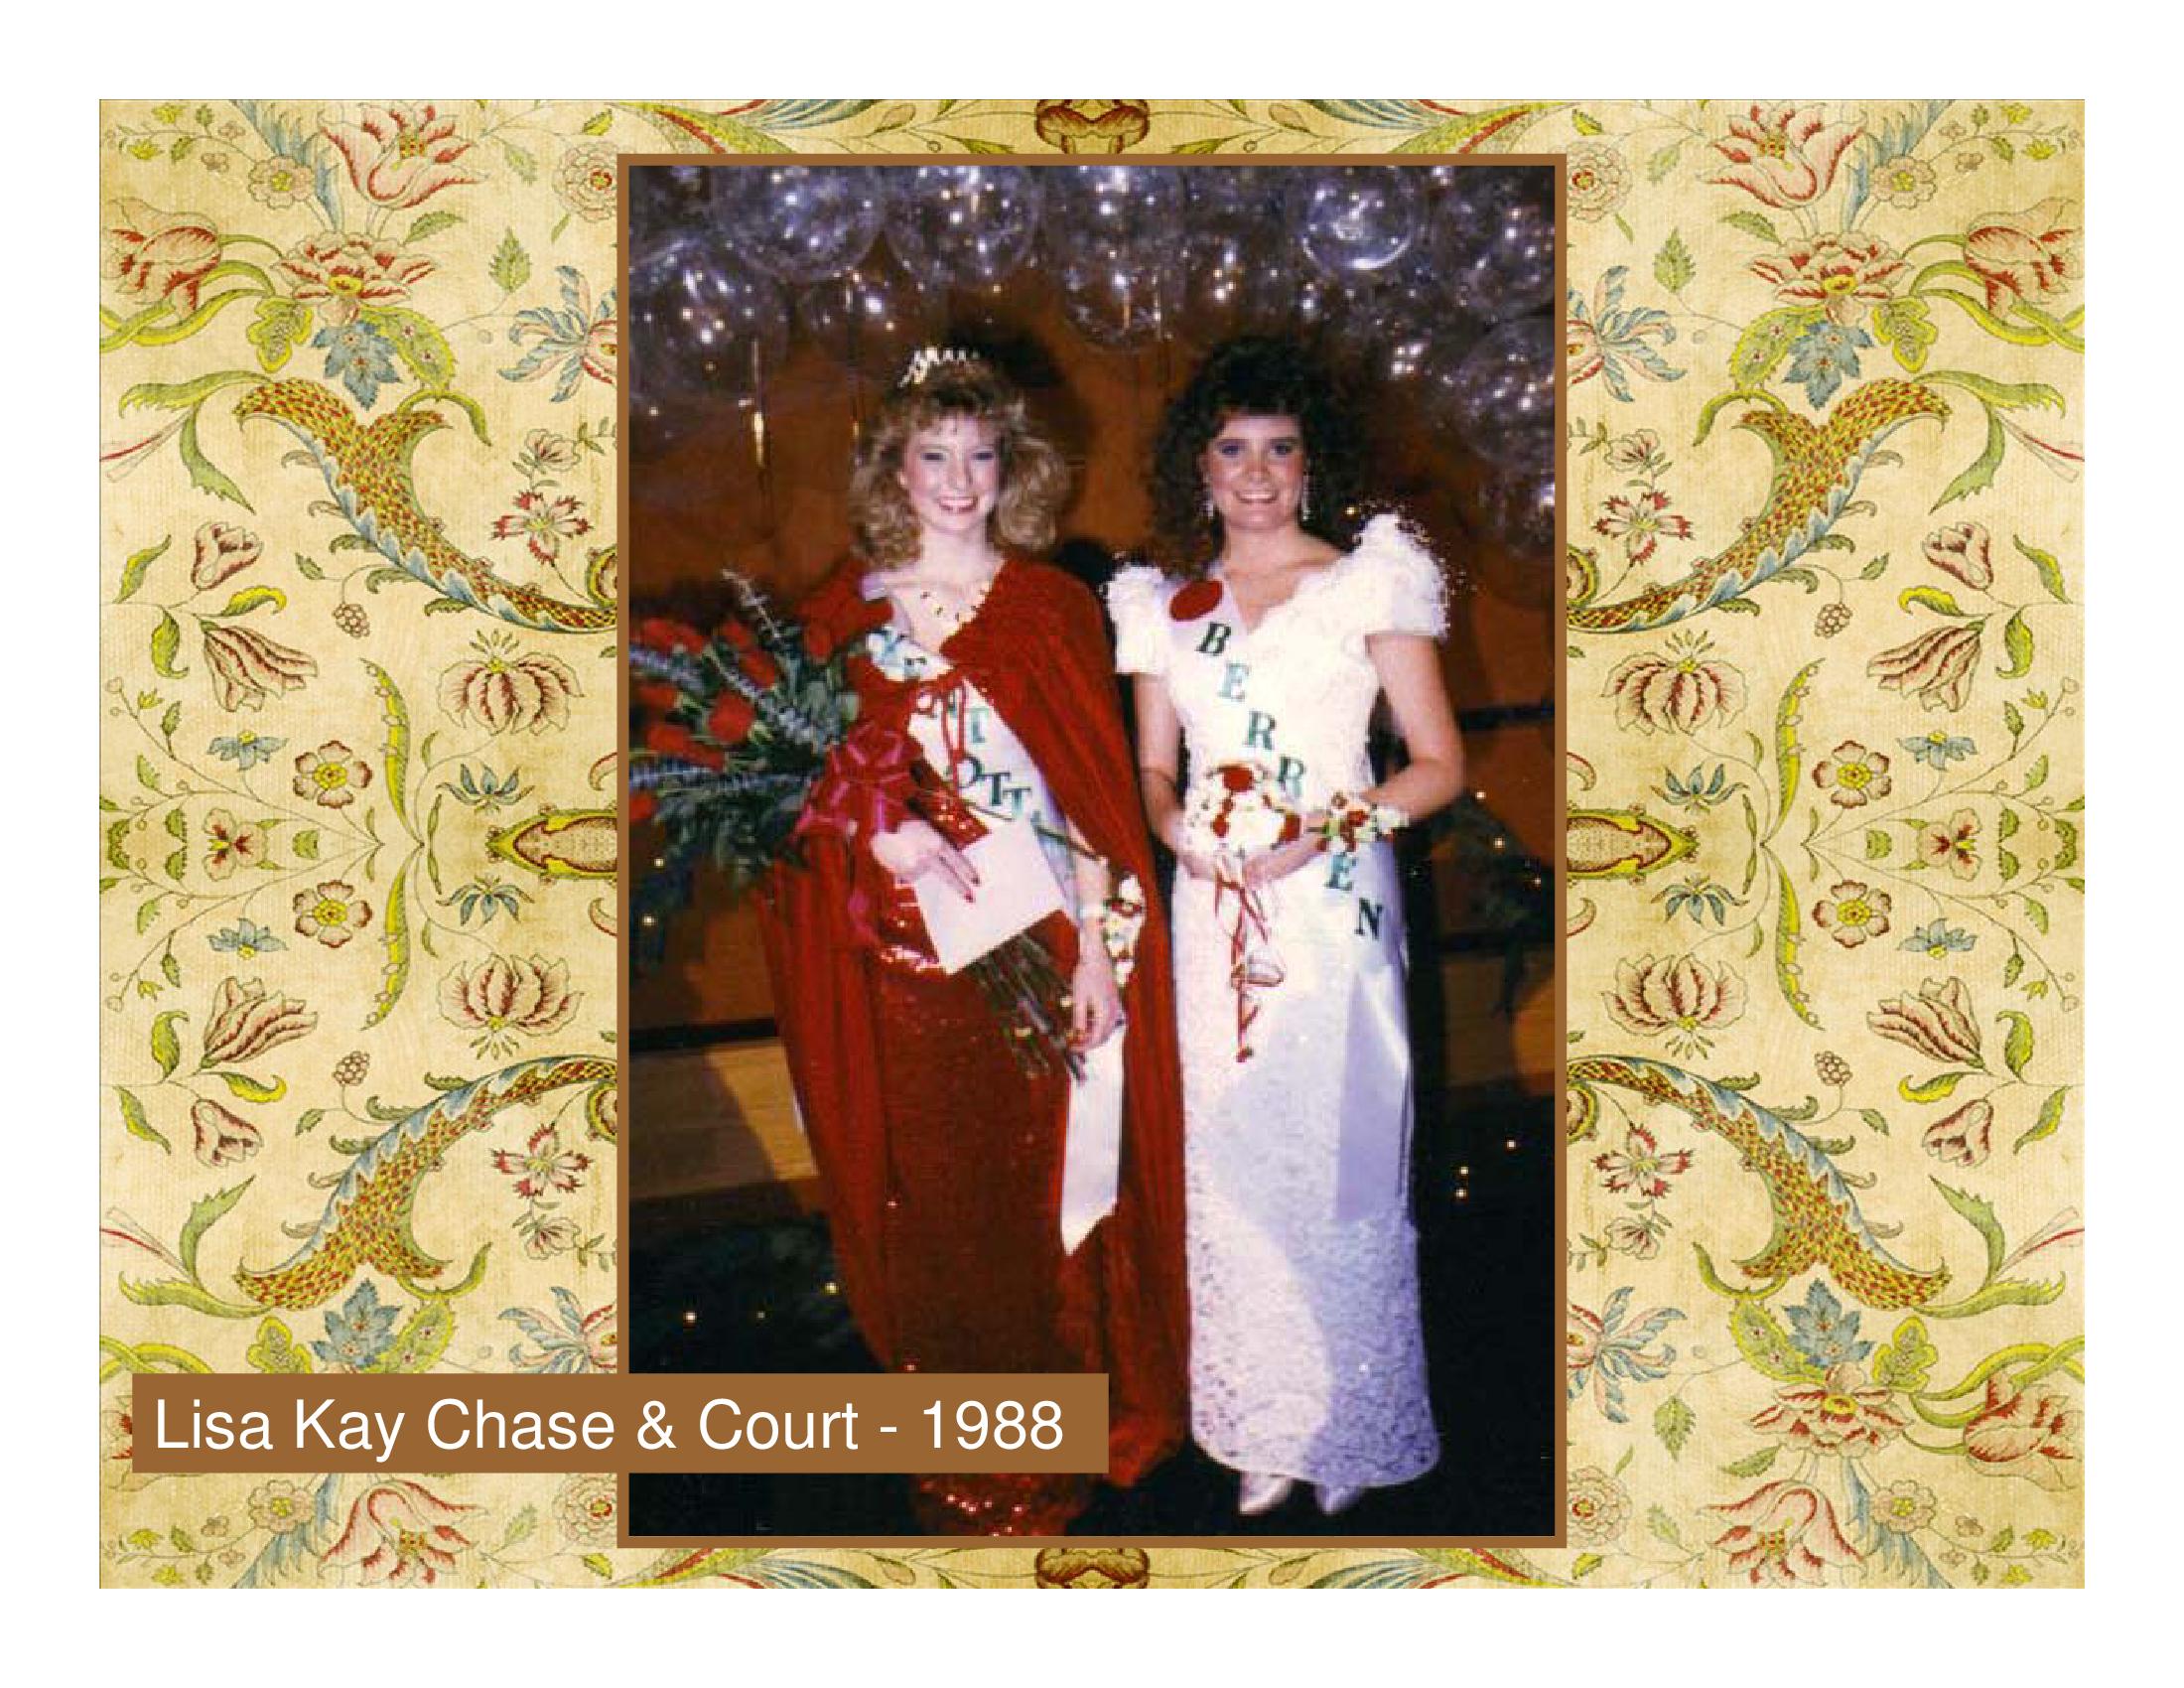 Lisa Kay Chase & Court - 1988